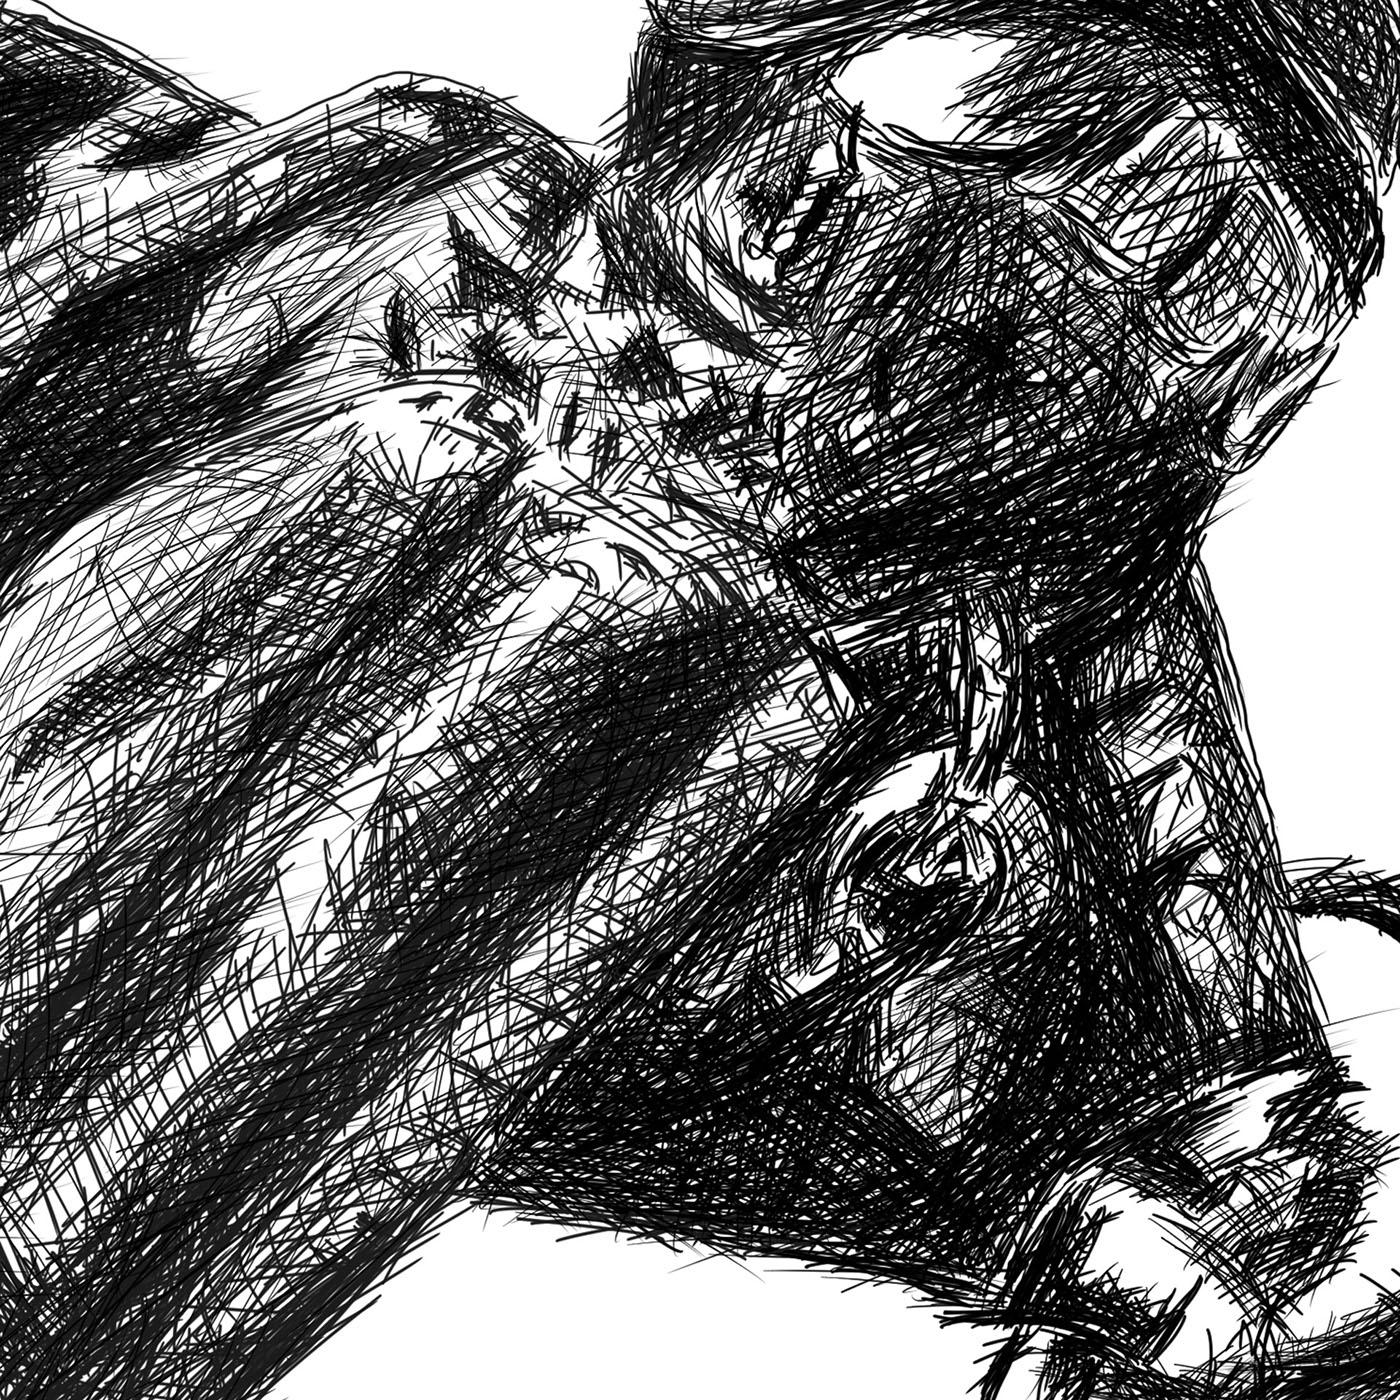 Samurai line drawing digital pencil ציור קווי סמוראי עיפרון דיגיטלי closeup4